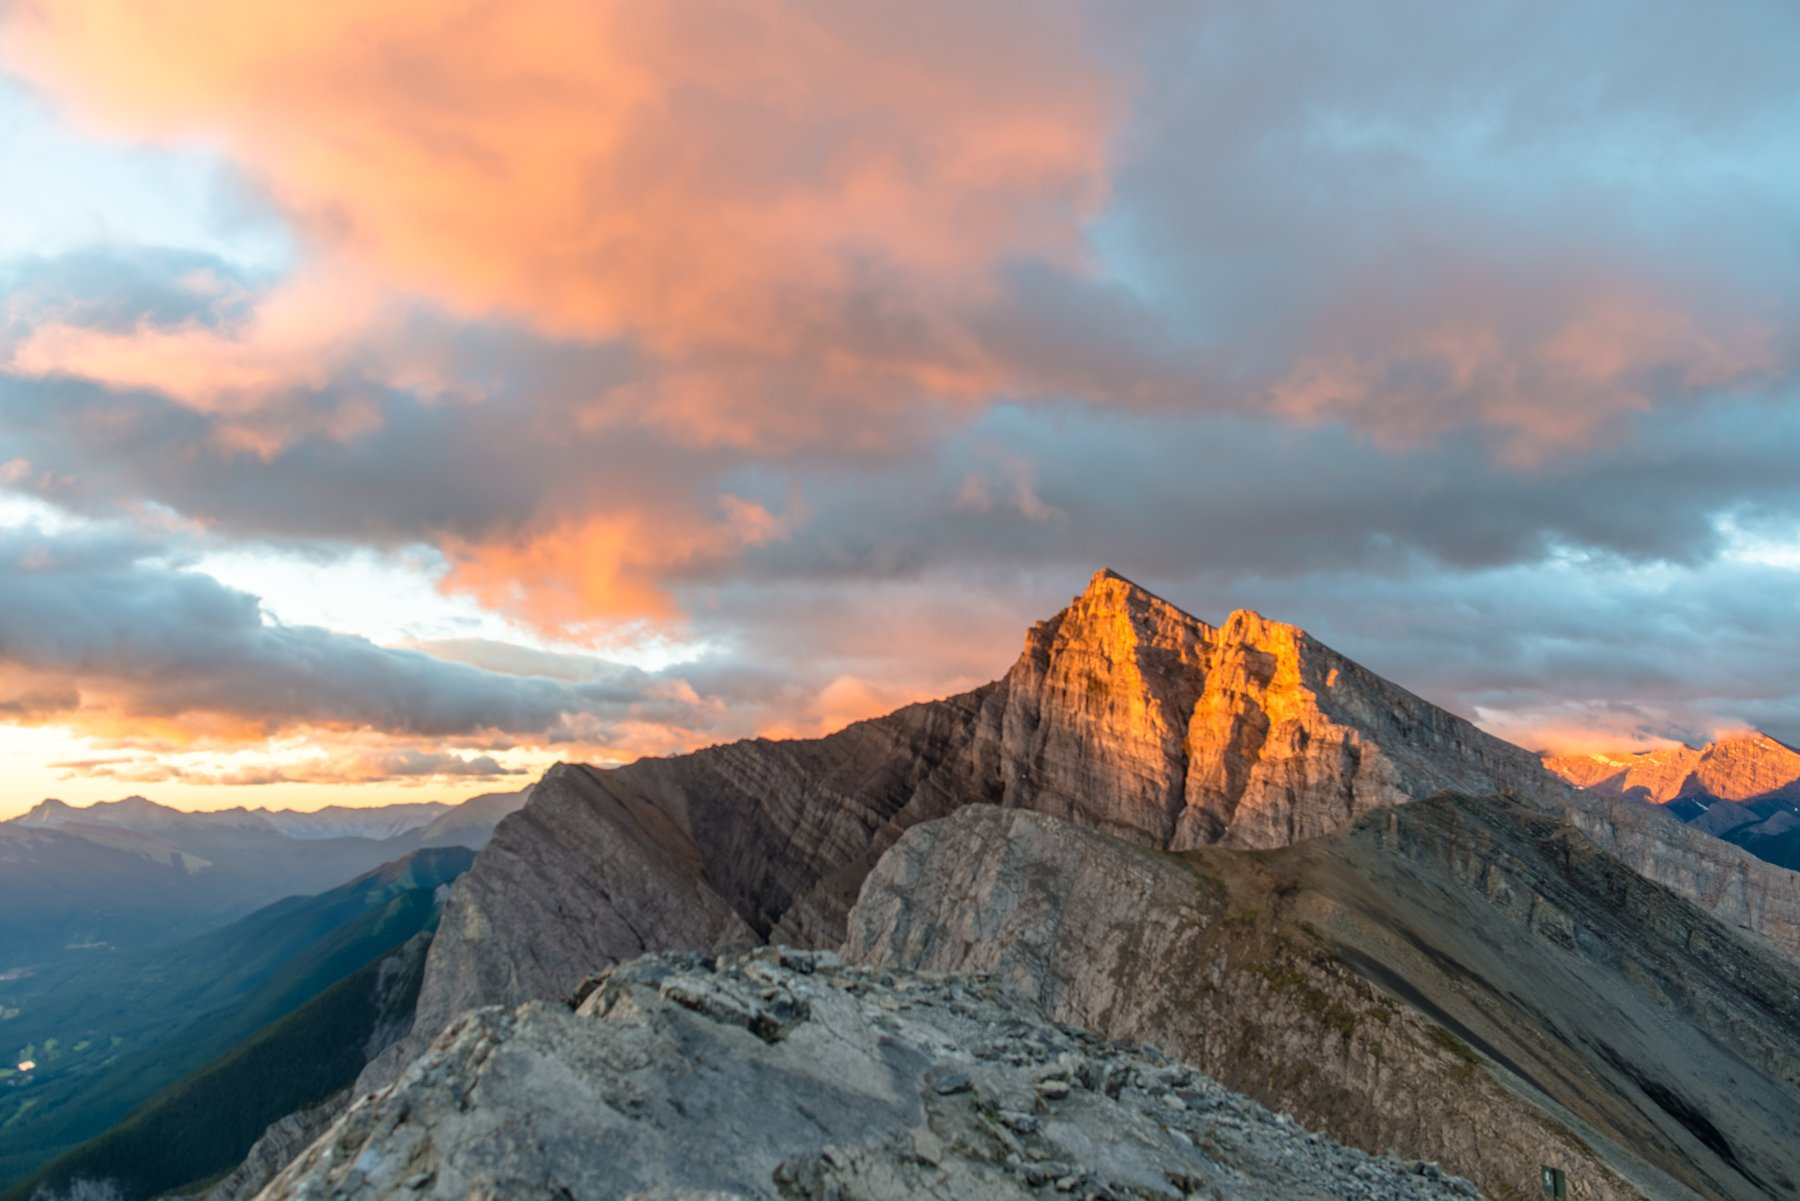 Canada, Alberta, Kananaskis, Mountains, Rockies, Денис Семенов